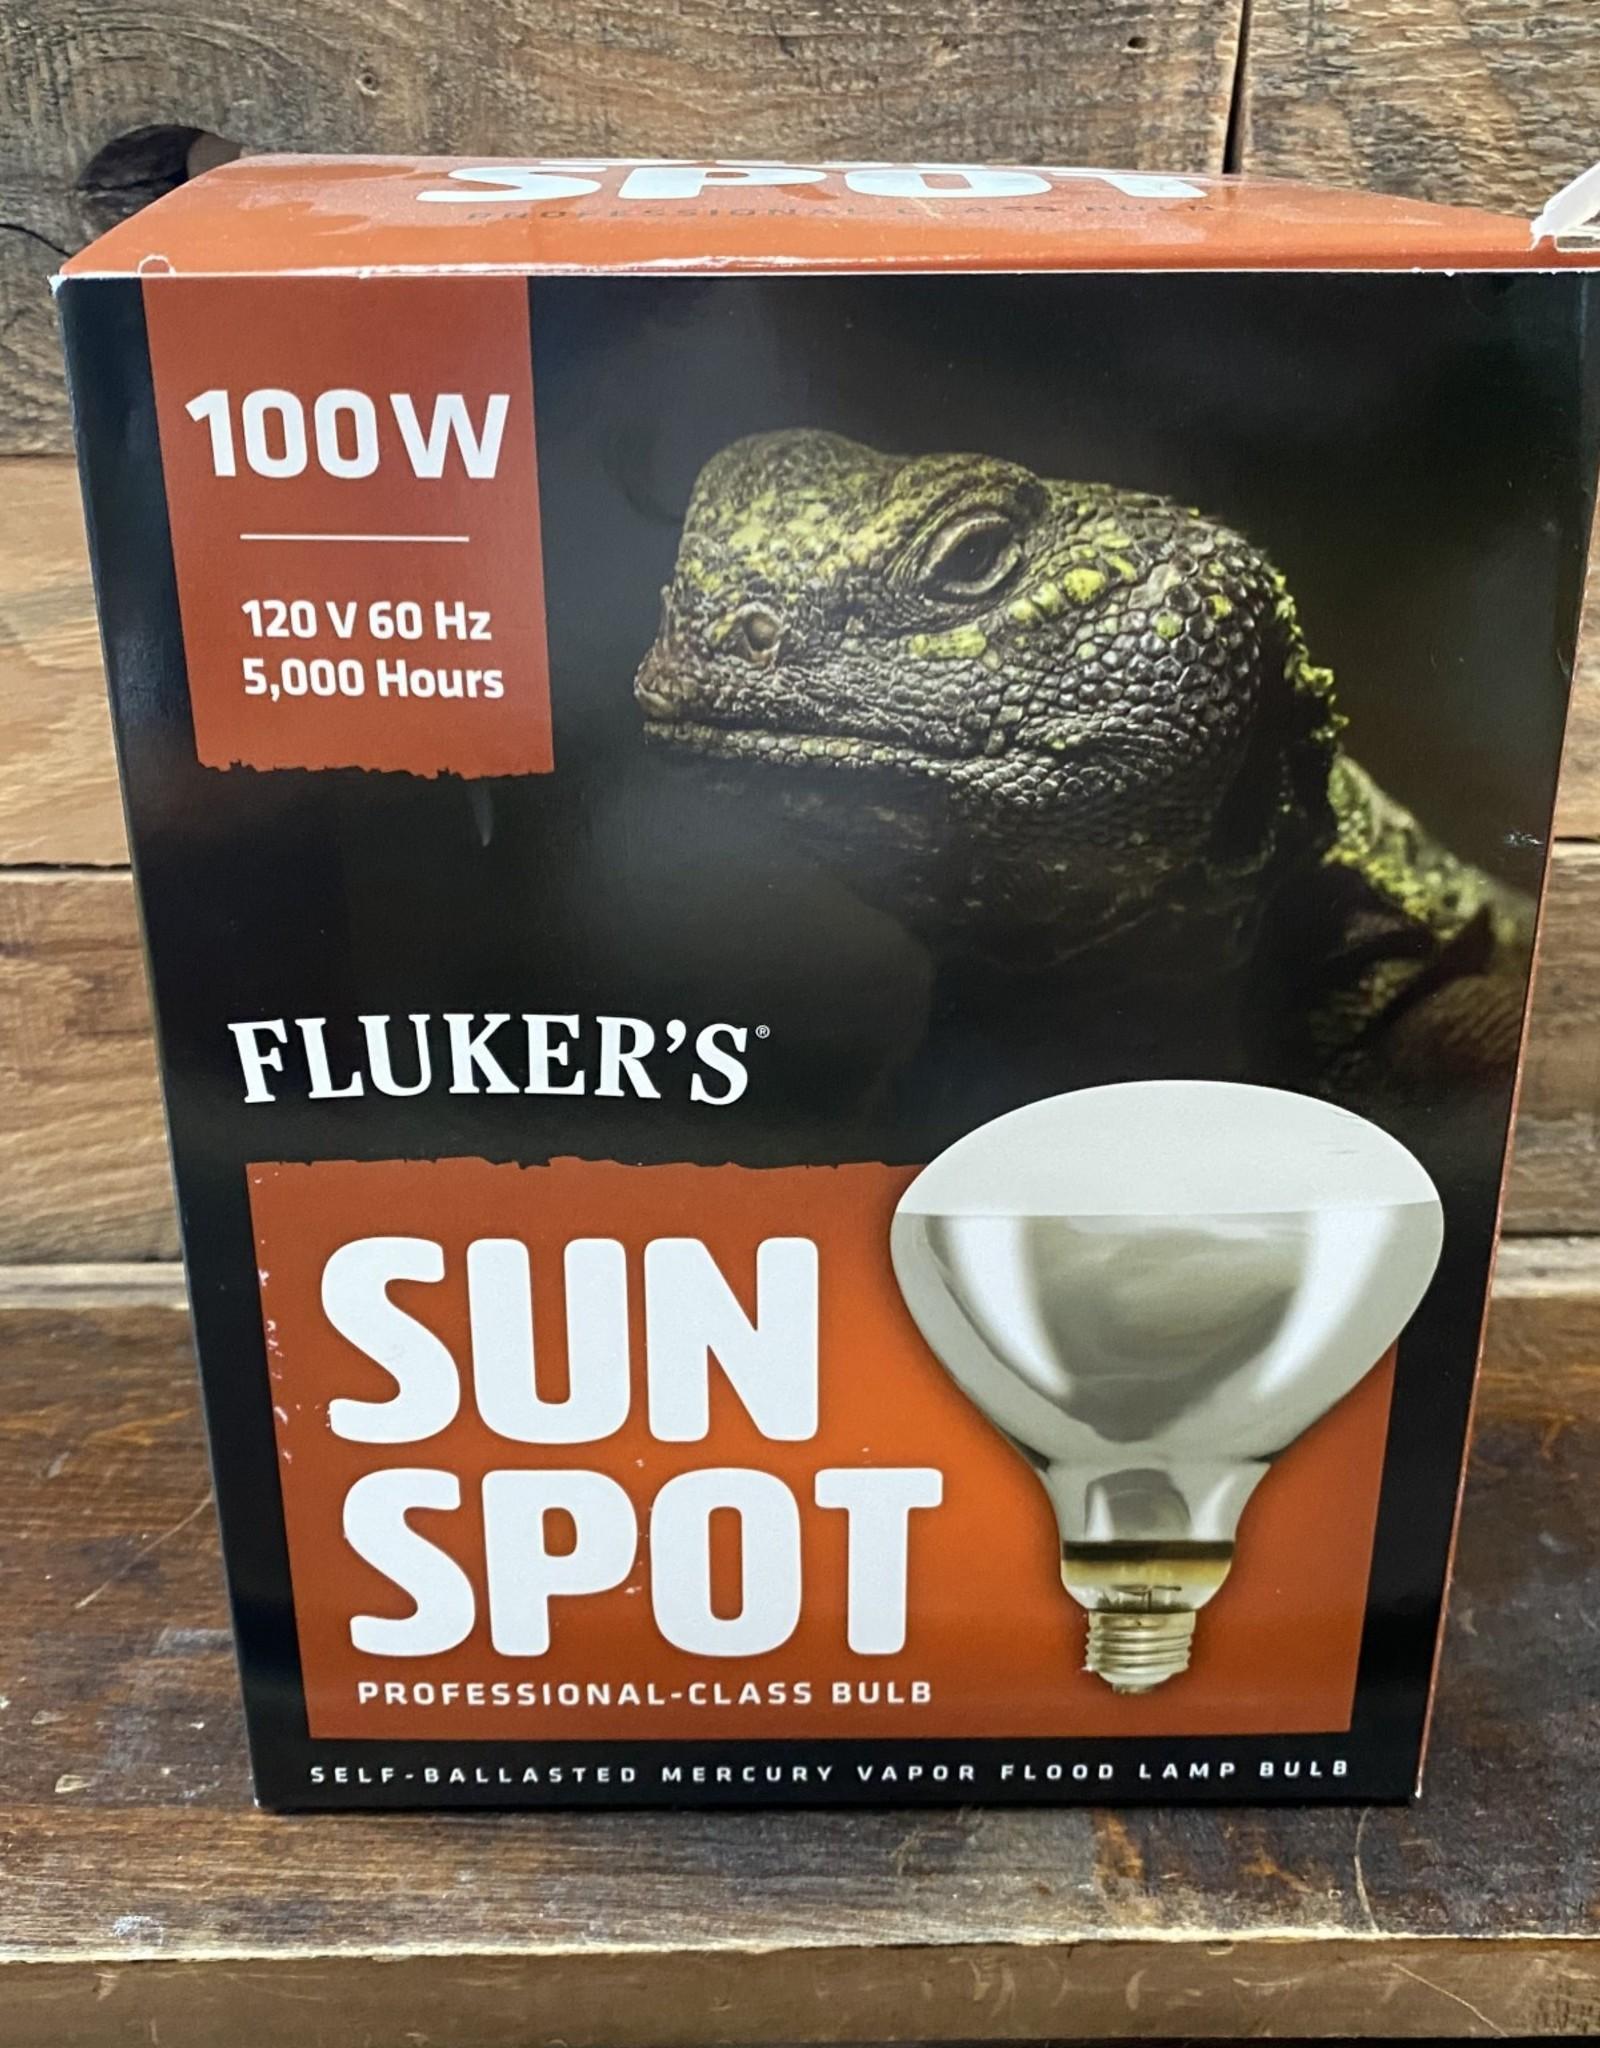 Fluker Sun Spot Bulb 100w.